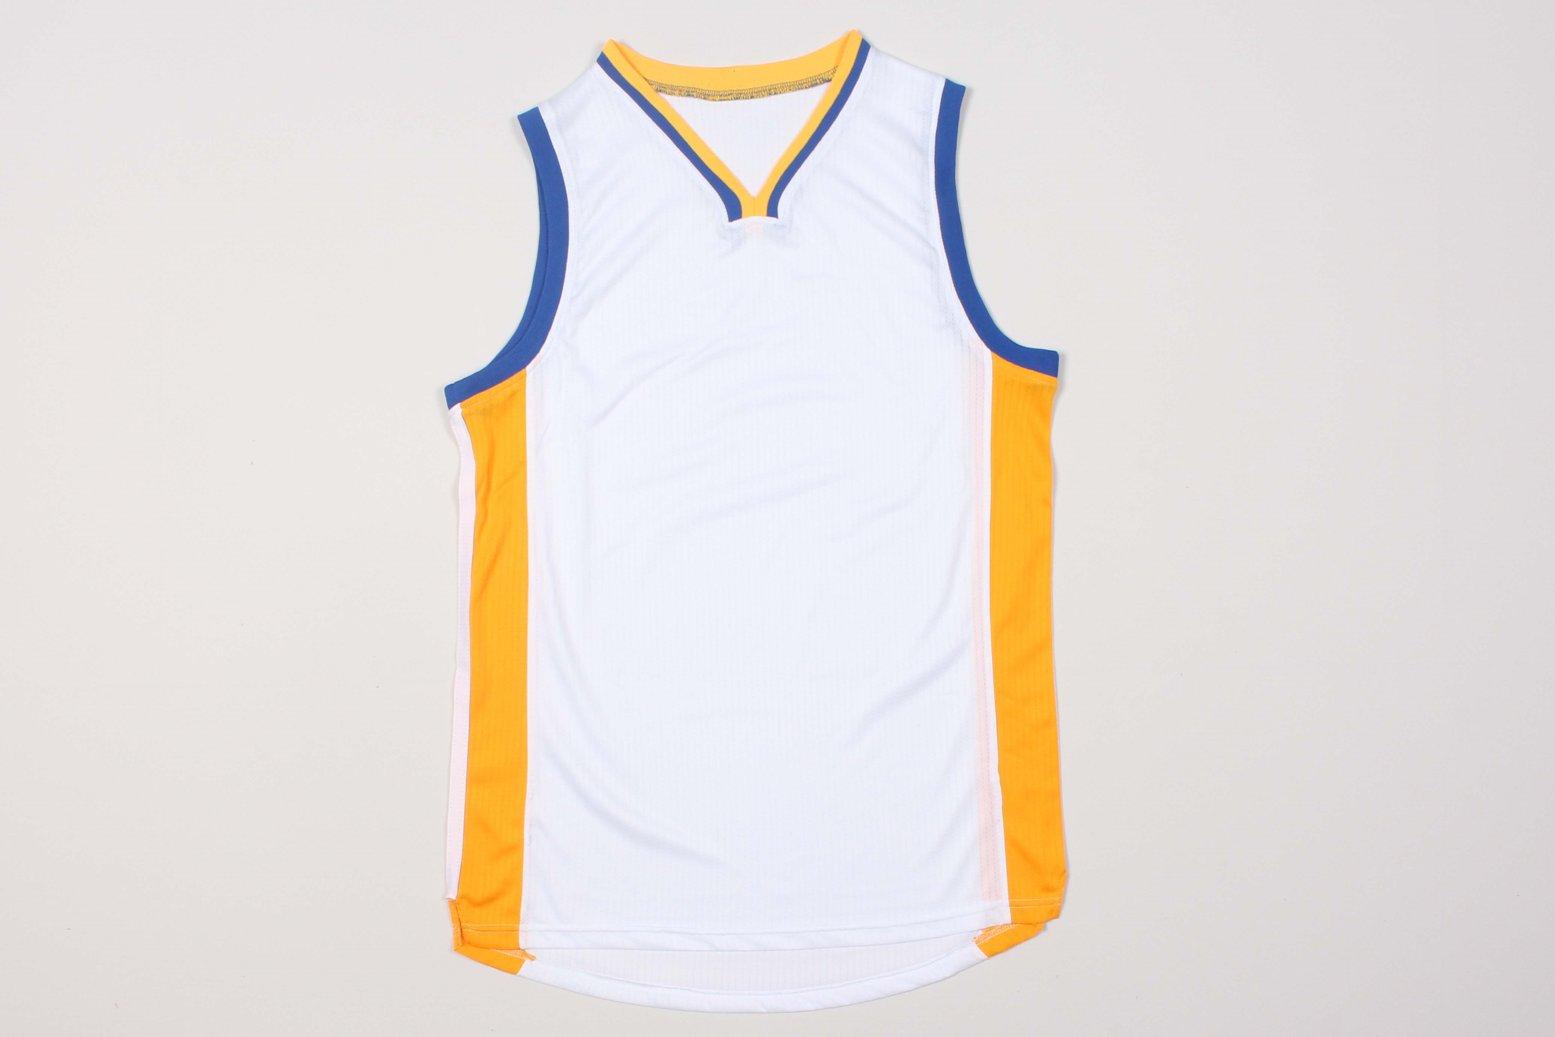 Баскетбольная форма Golden State Warriors